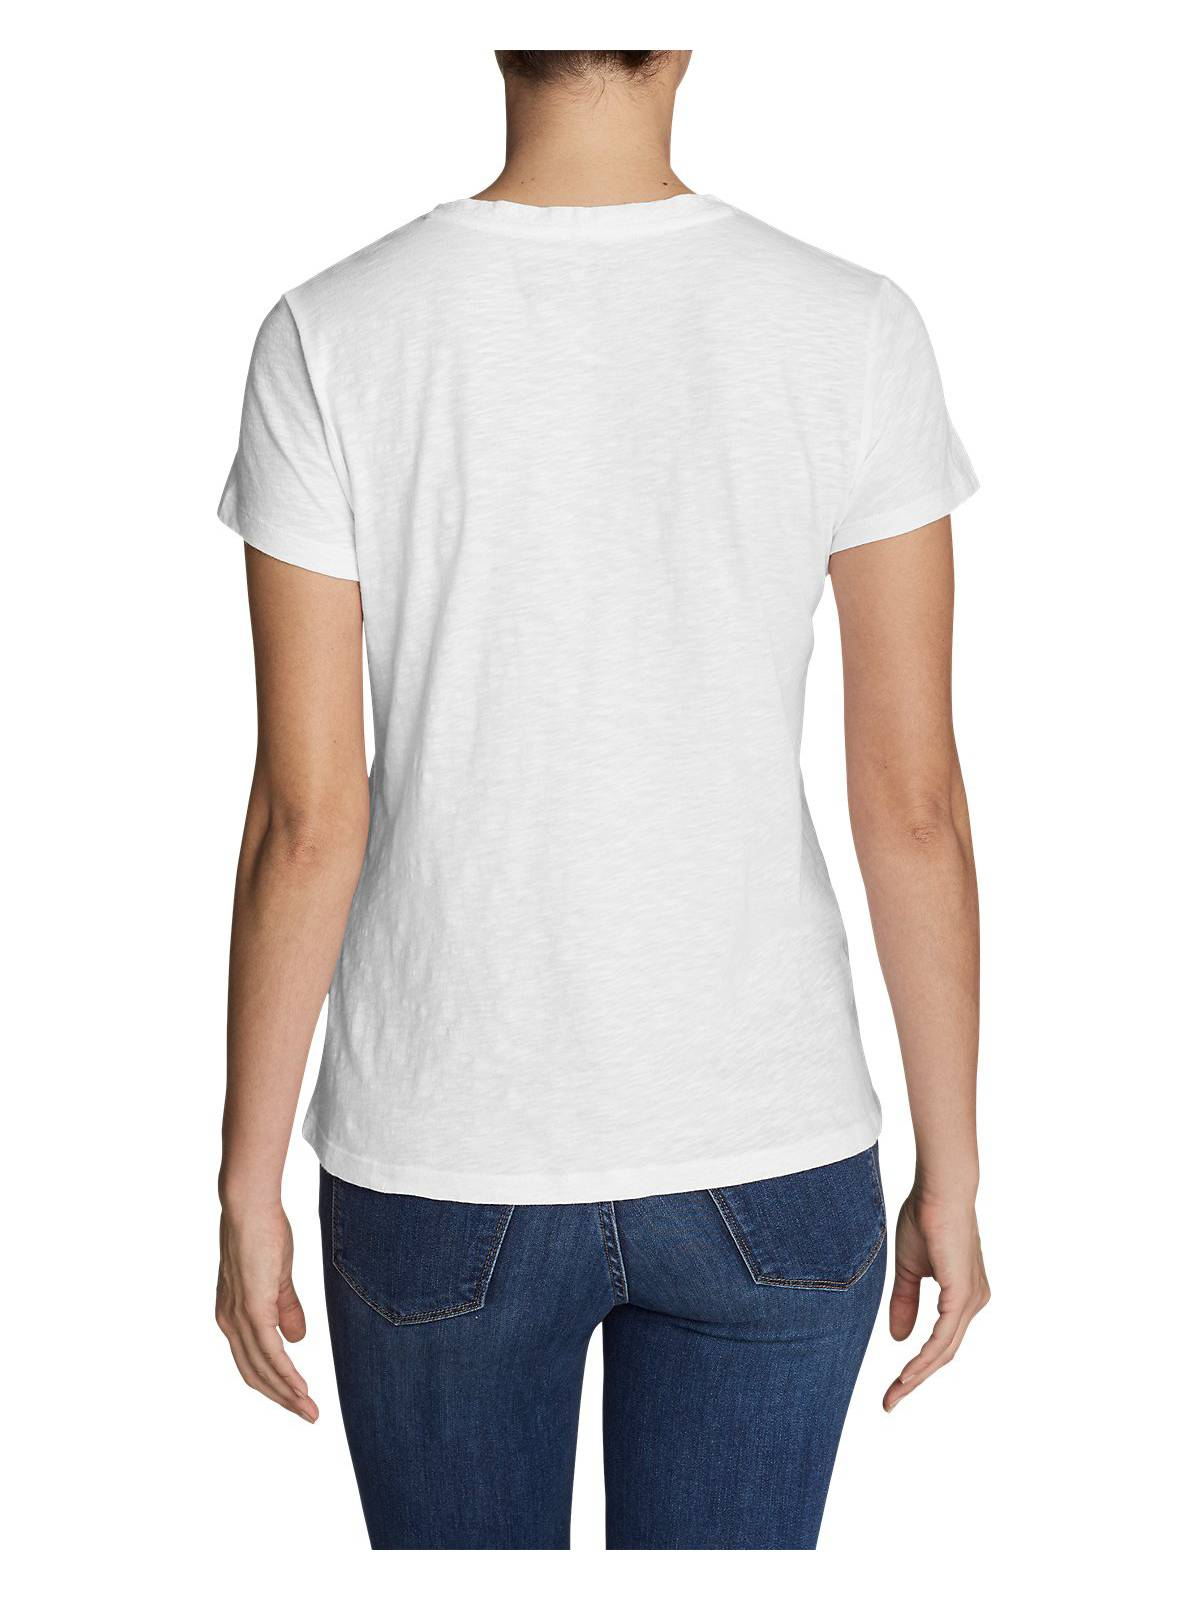 Eddie-Bauer-Women-039-s-Legend-Wash-Slub-Short-Sleeve-V-Neck-T-Shirt thumbnail 11